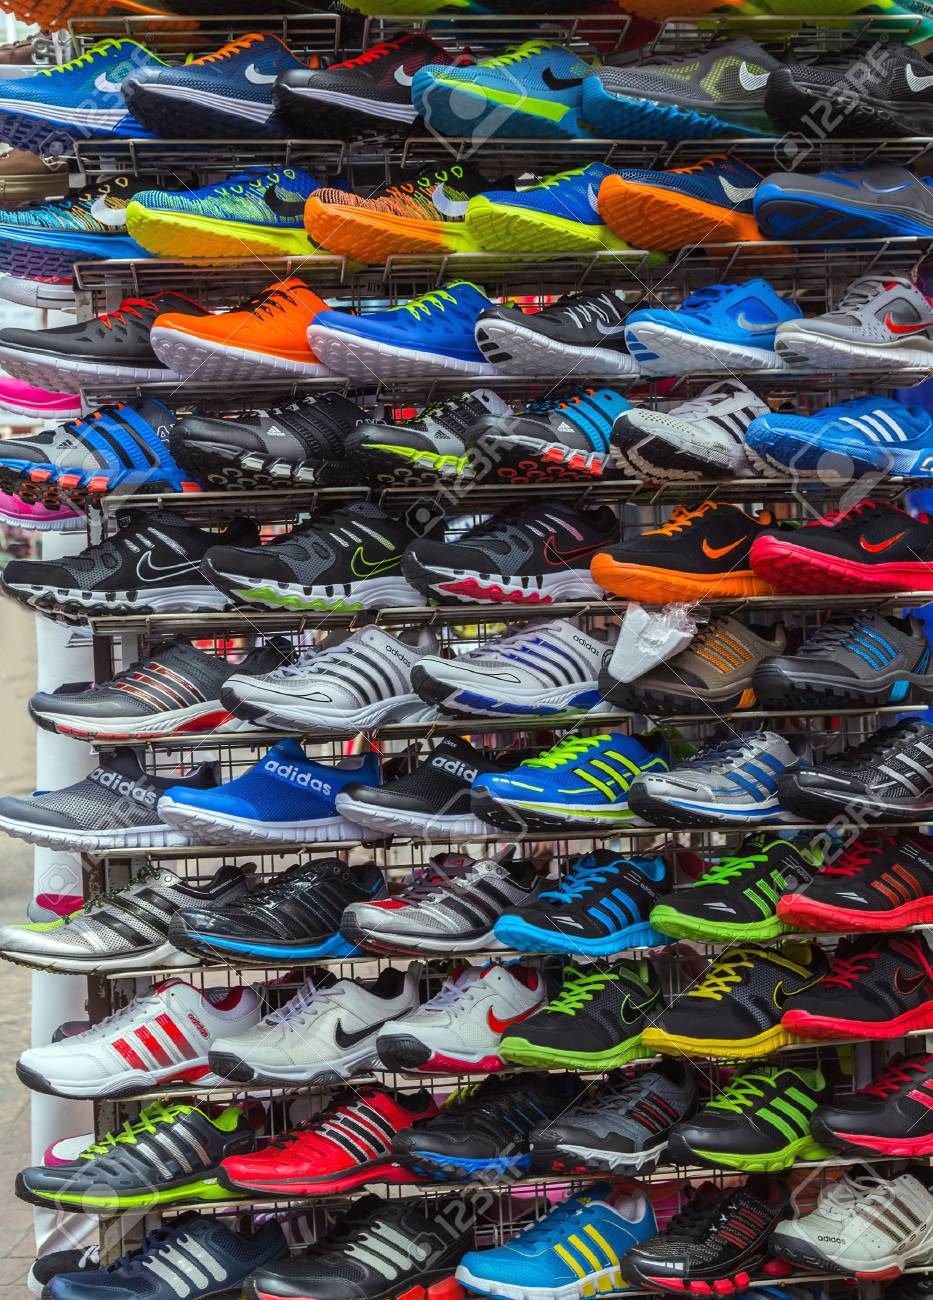 a9f0106688b30d Kuala Lumpur, Malaysia - February 19, 2015: Central Market sale Adidas Shoes  In